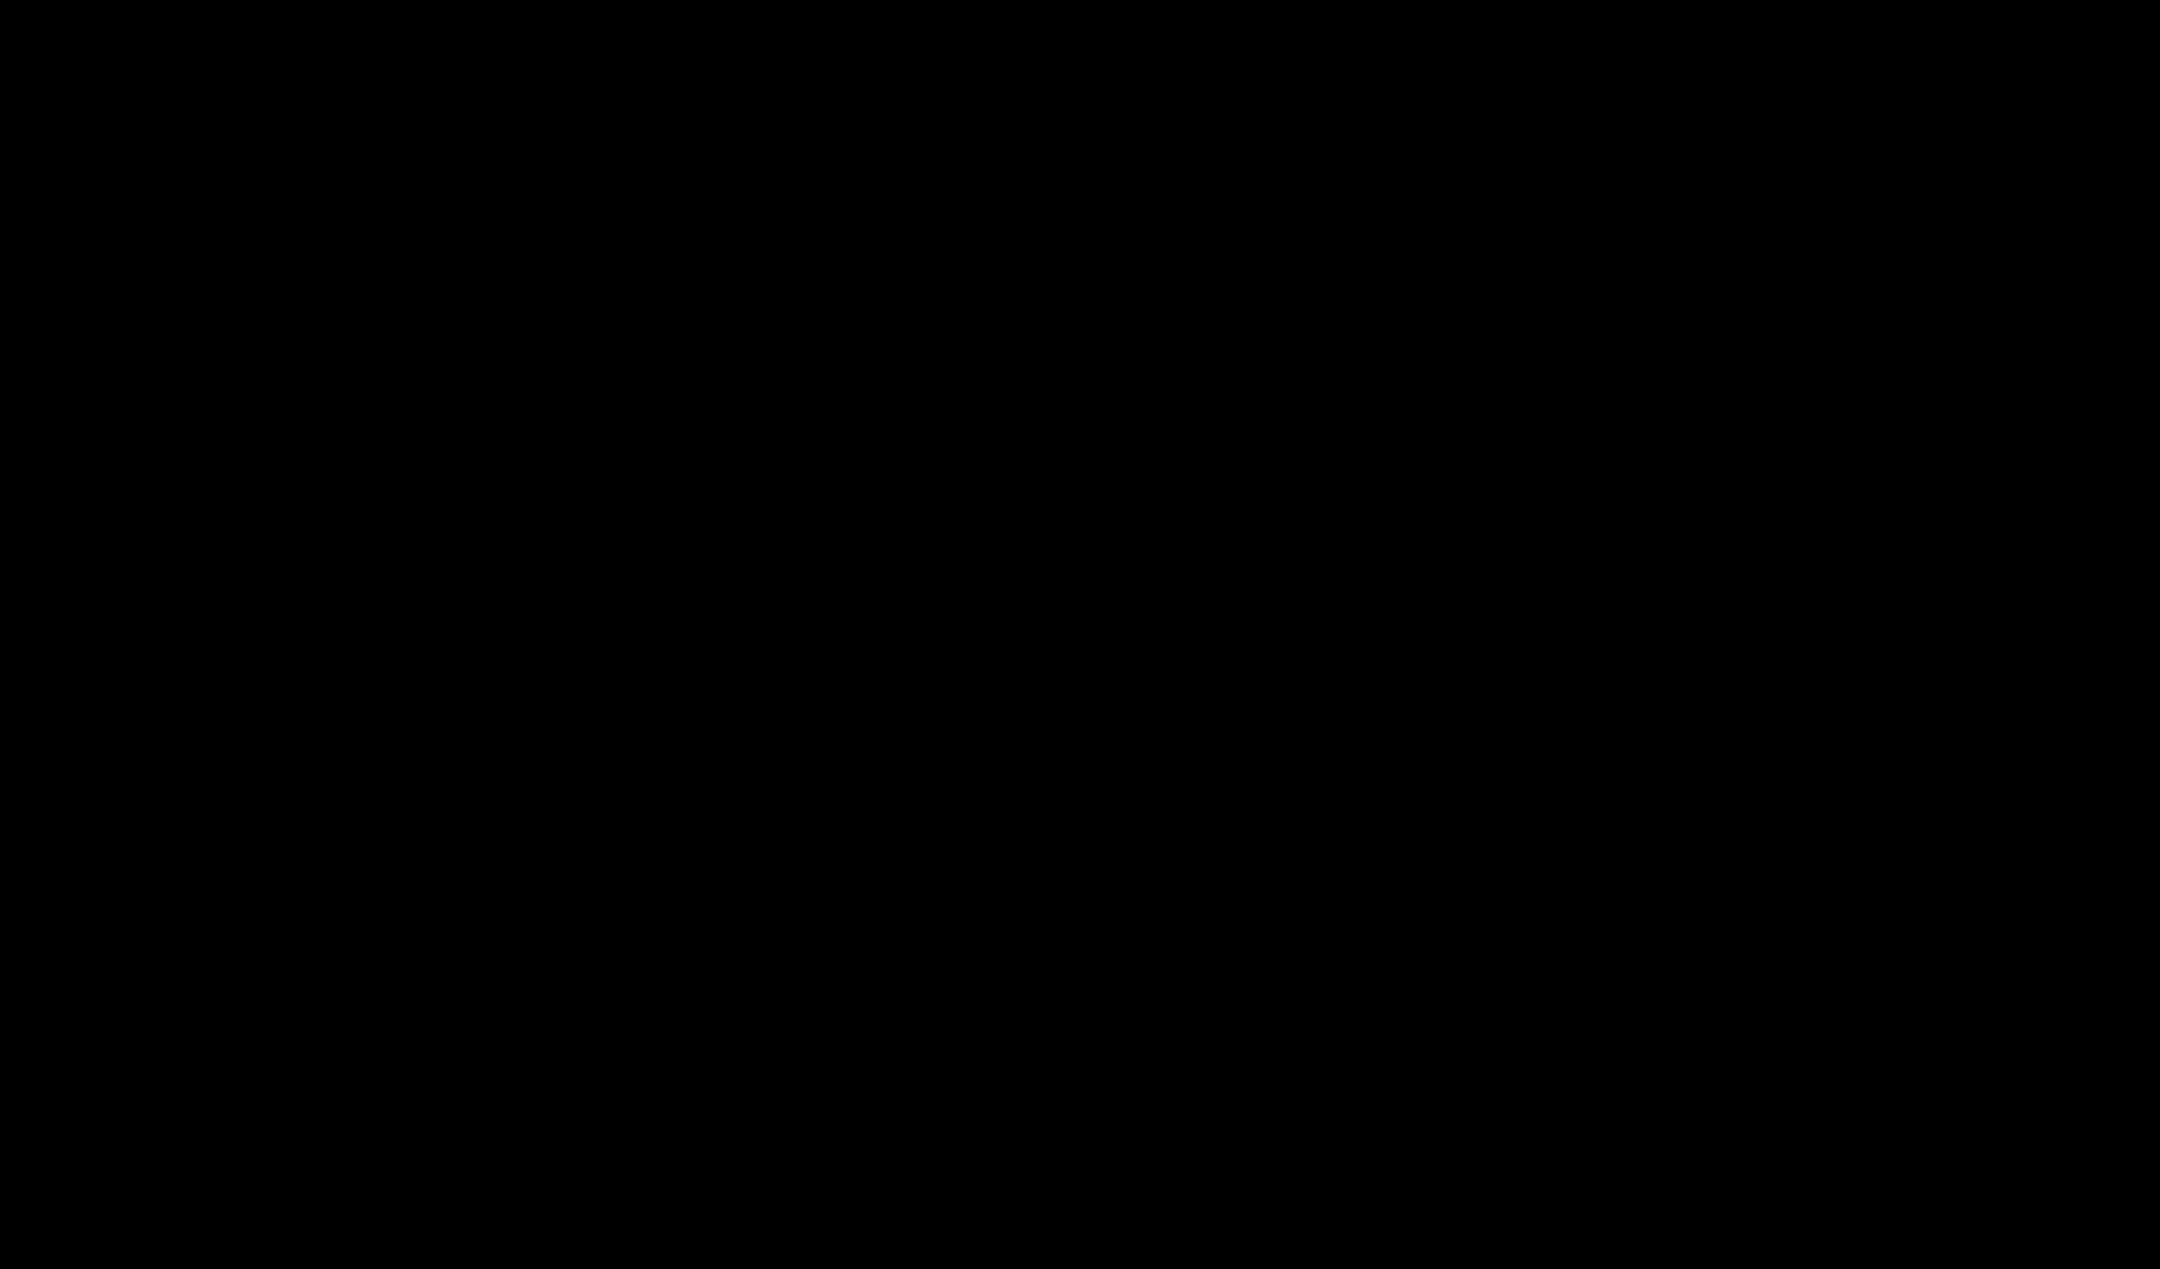 northrop grumman logo 2 - Northrop Grumman Logo